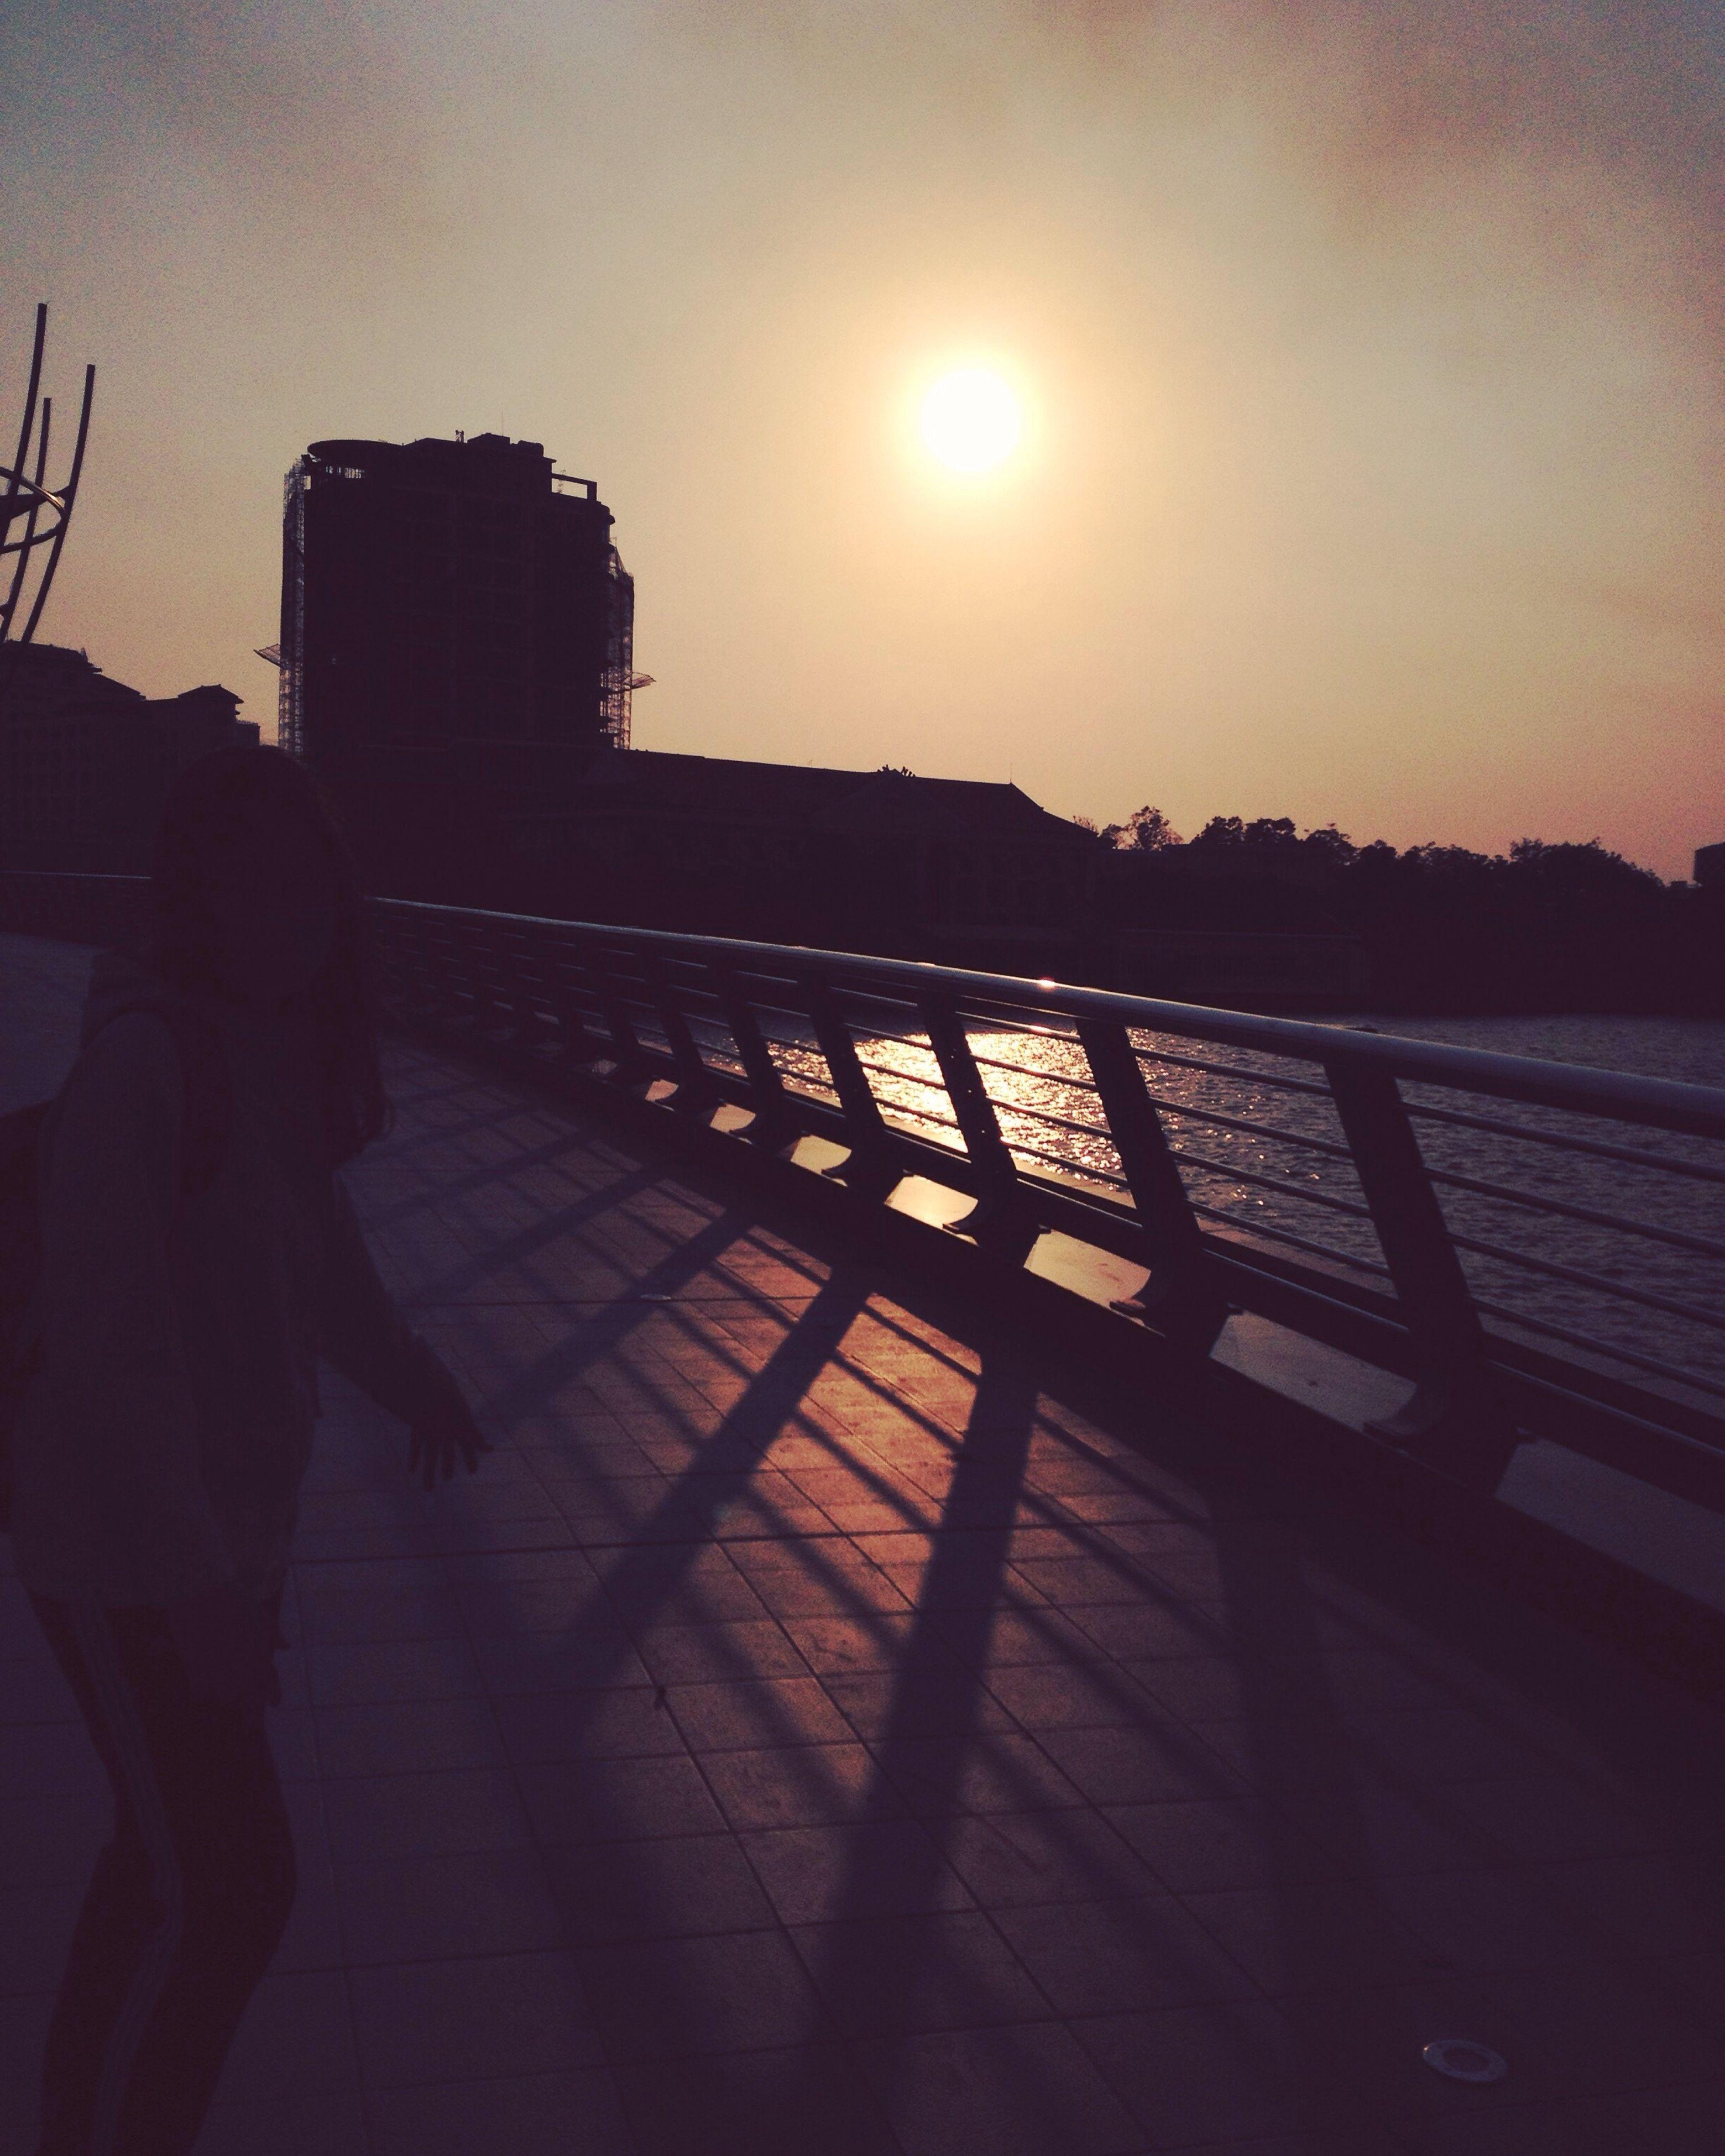 sunset, sun, silhouette, built structure, building exterior, architecture, sunlight, sky, sunbeam, lens flare, railing, clear sky, city, outdoors, orange color, shadow, reflection, building